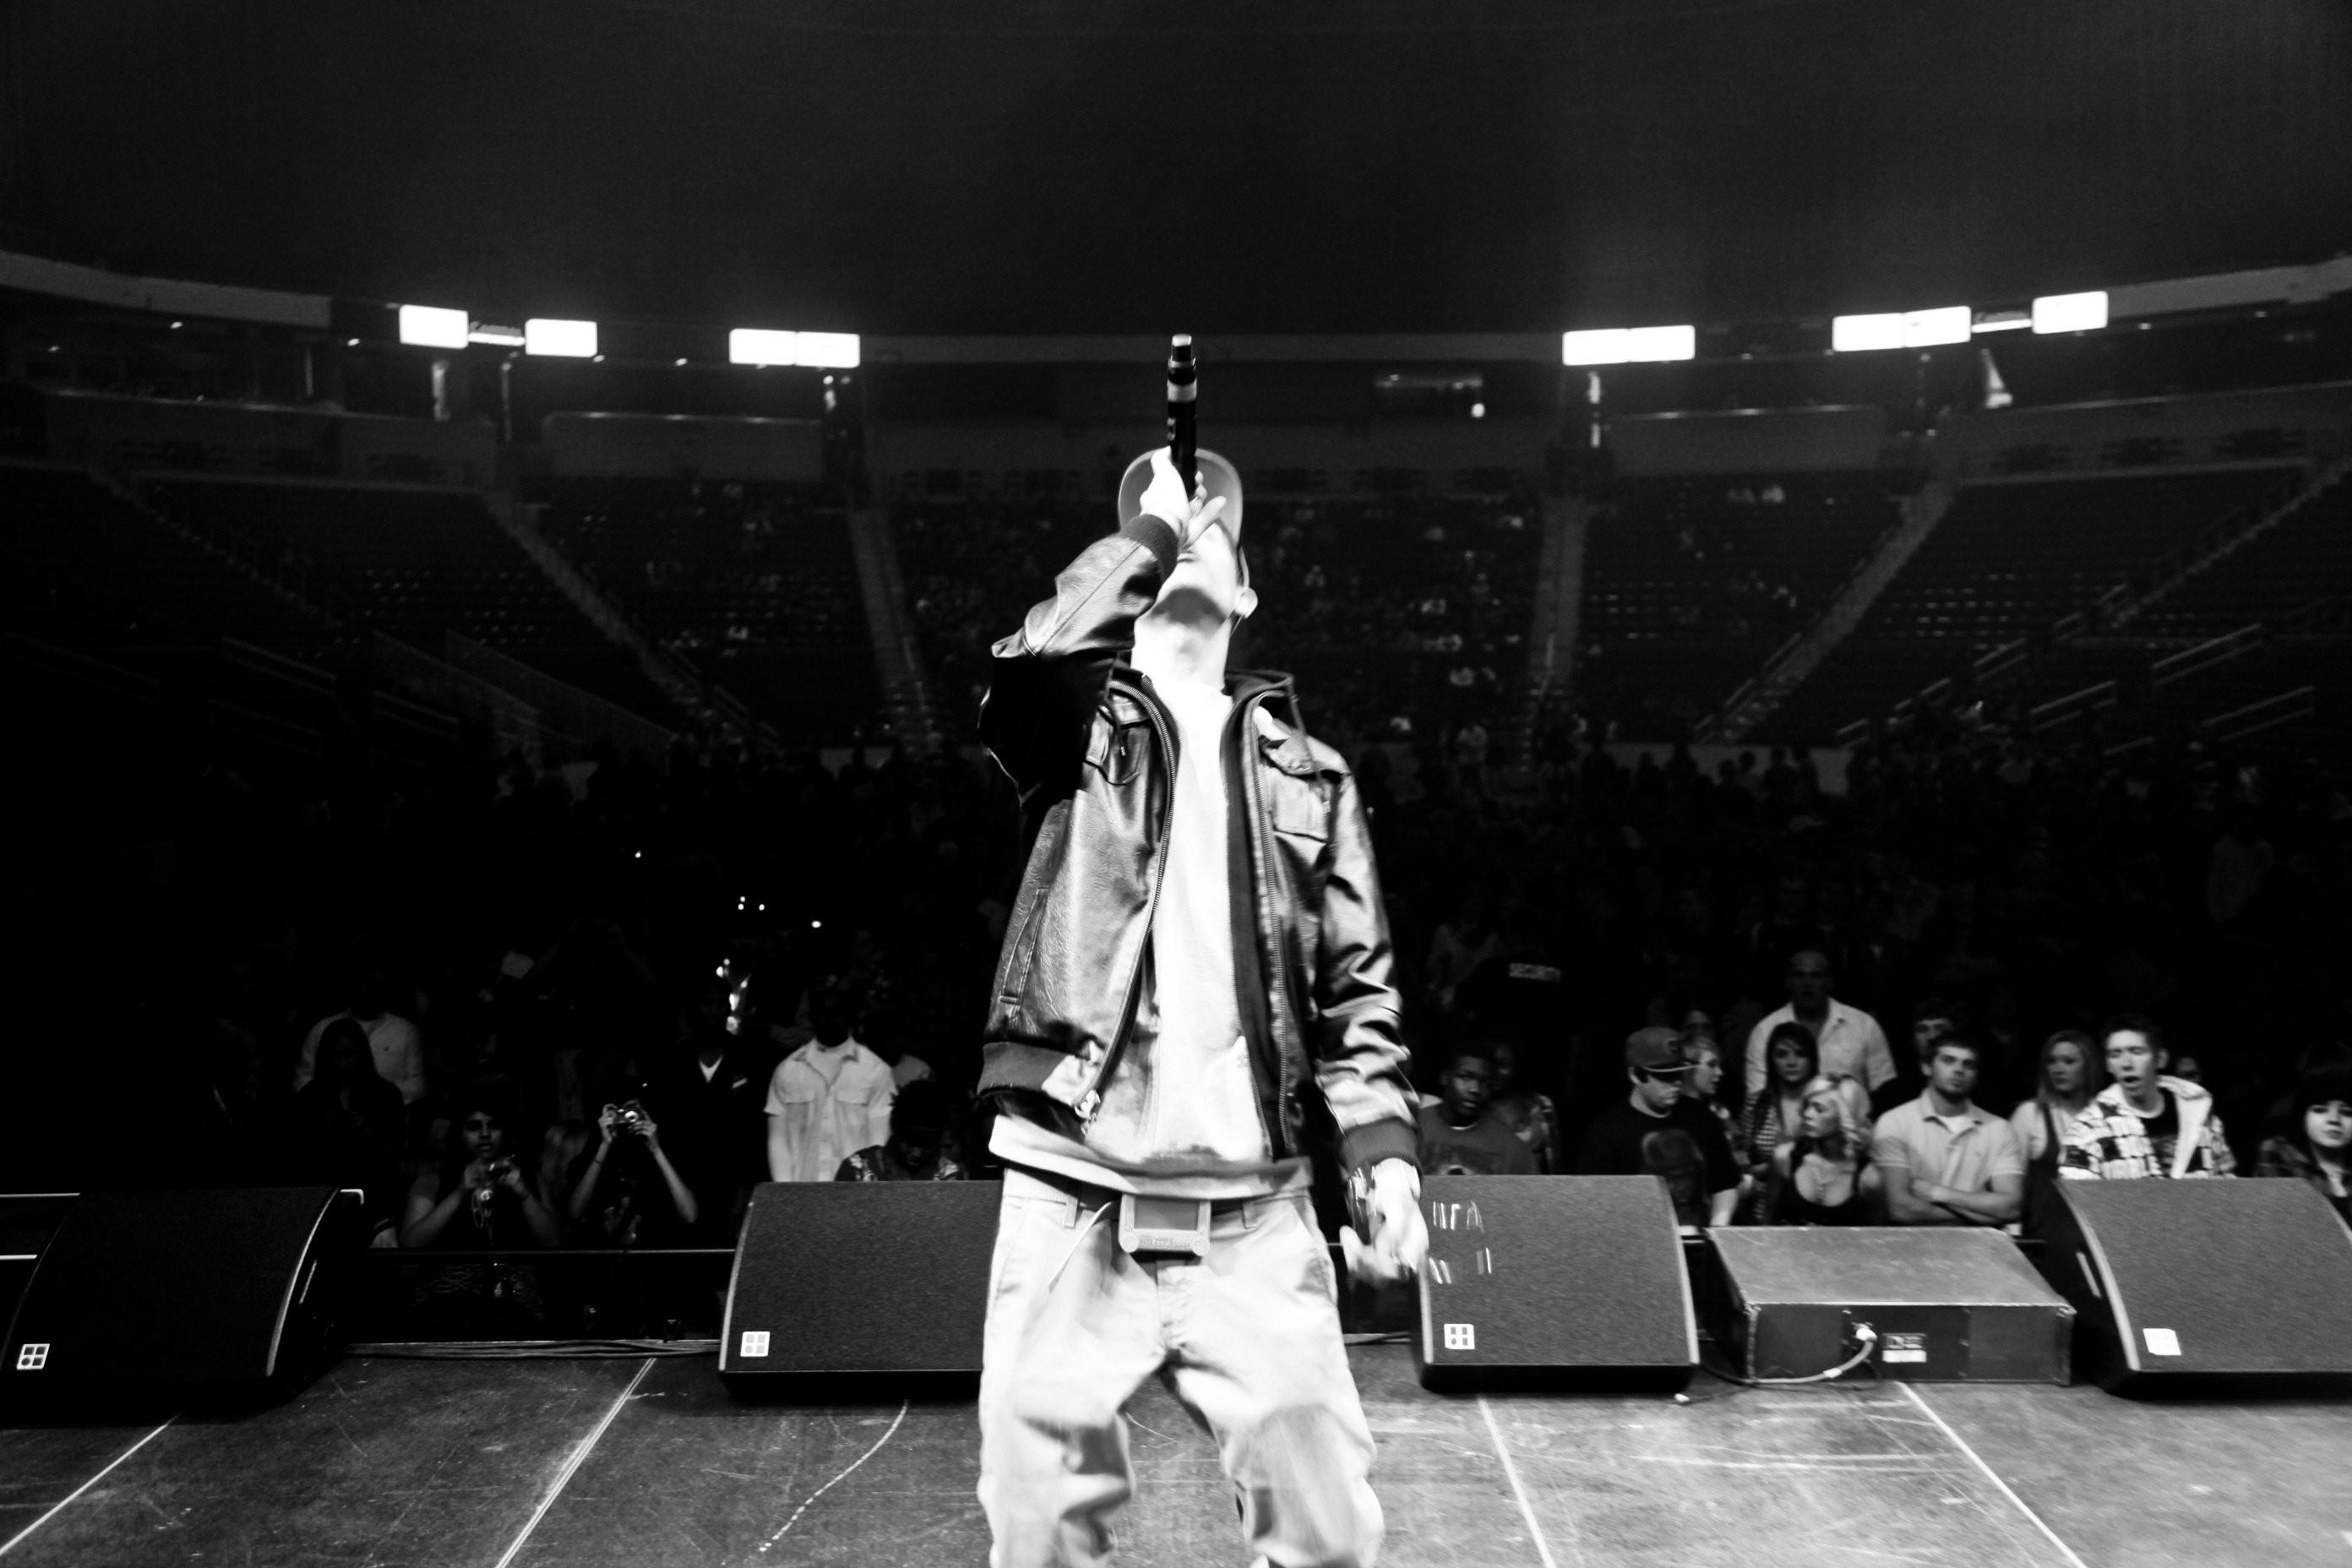 … hhG-Eazy – artist photos …